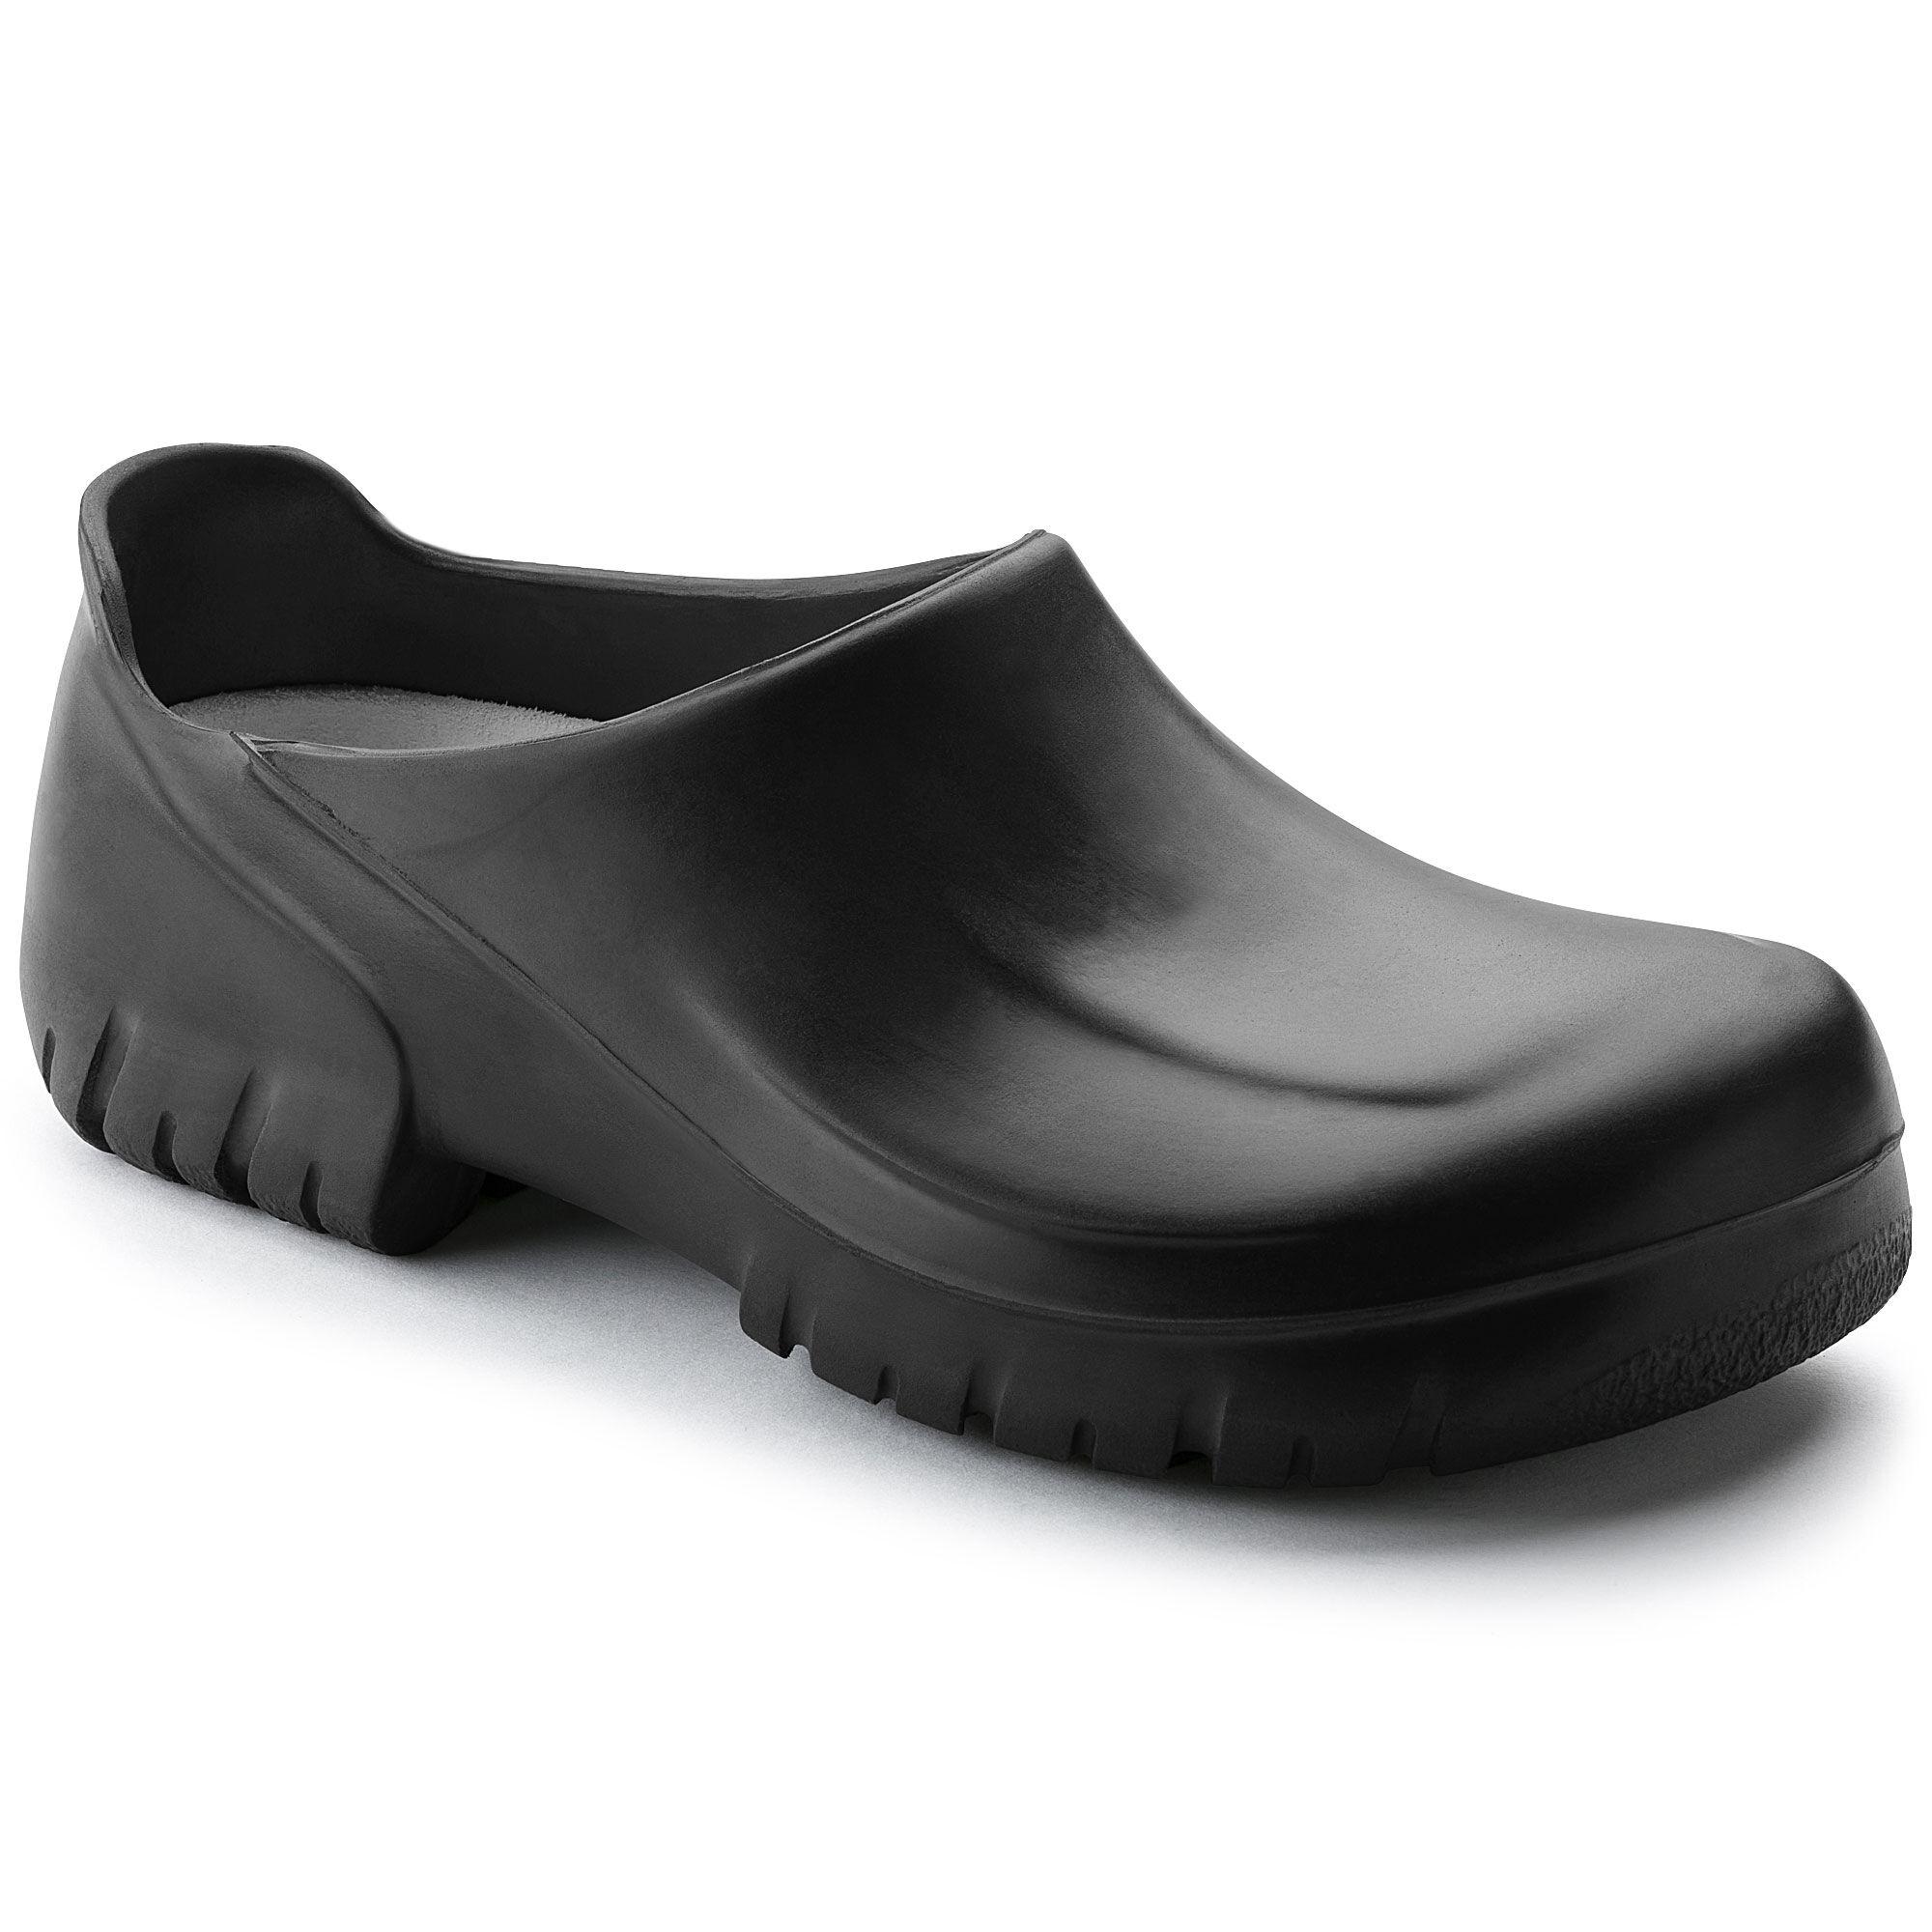 chef kitchen shoes birkenstock rh birkenstock com Birkenstock Kitchen Clogs for Men Birkenstocks for Plantar Fasciitis